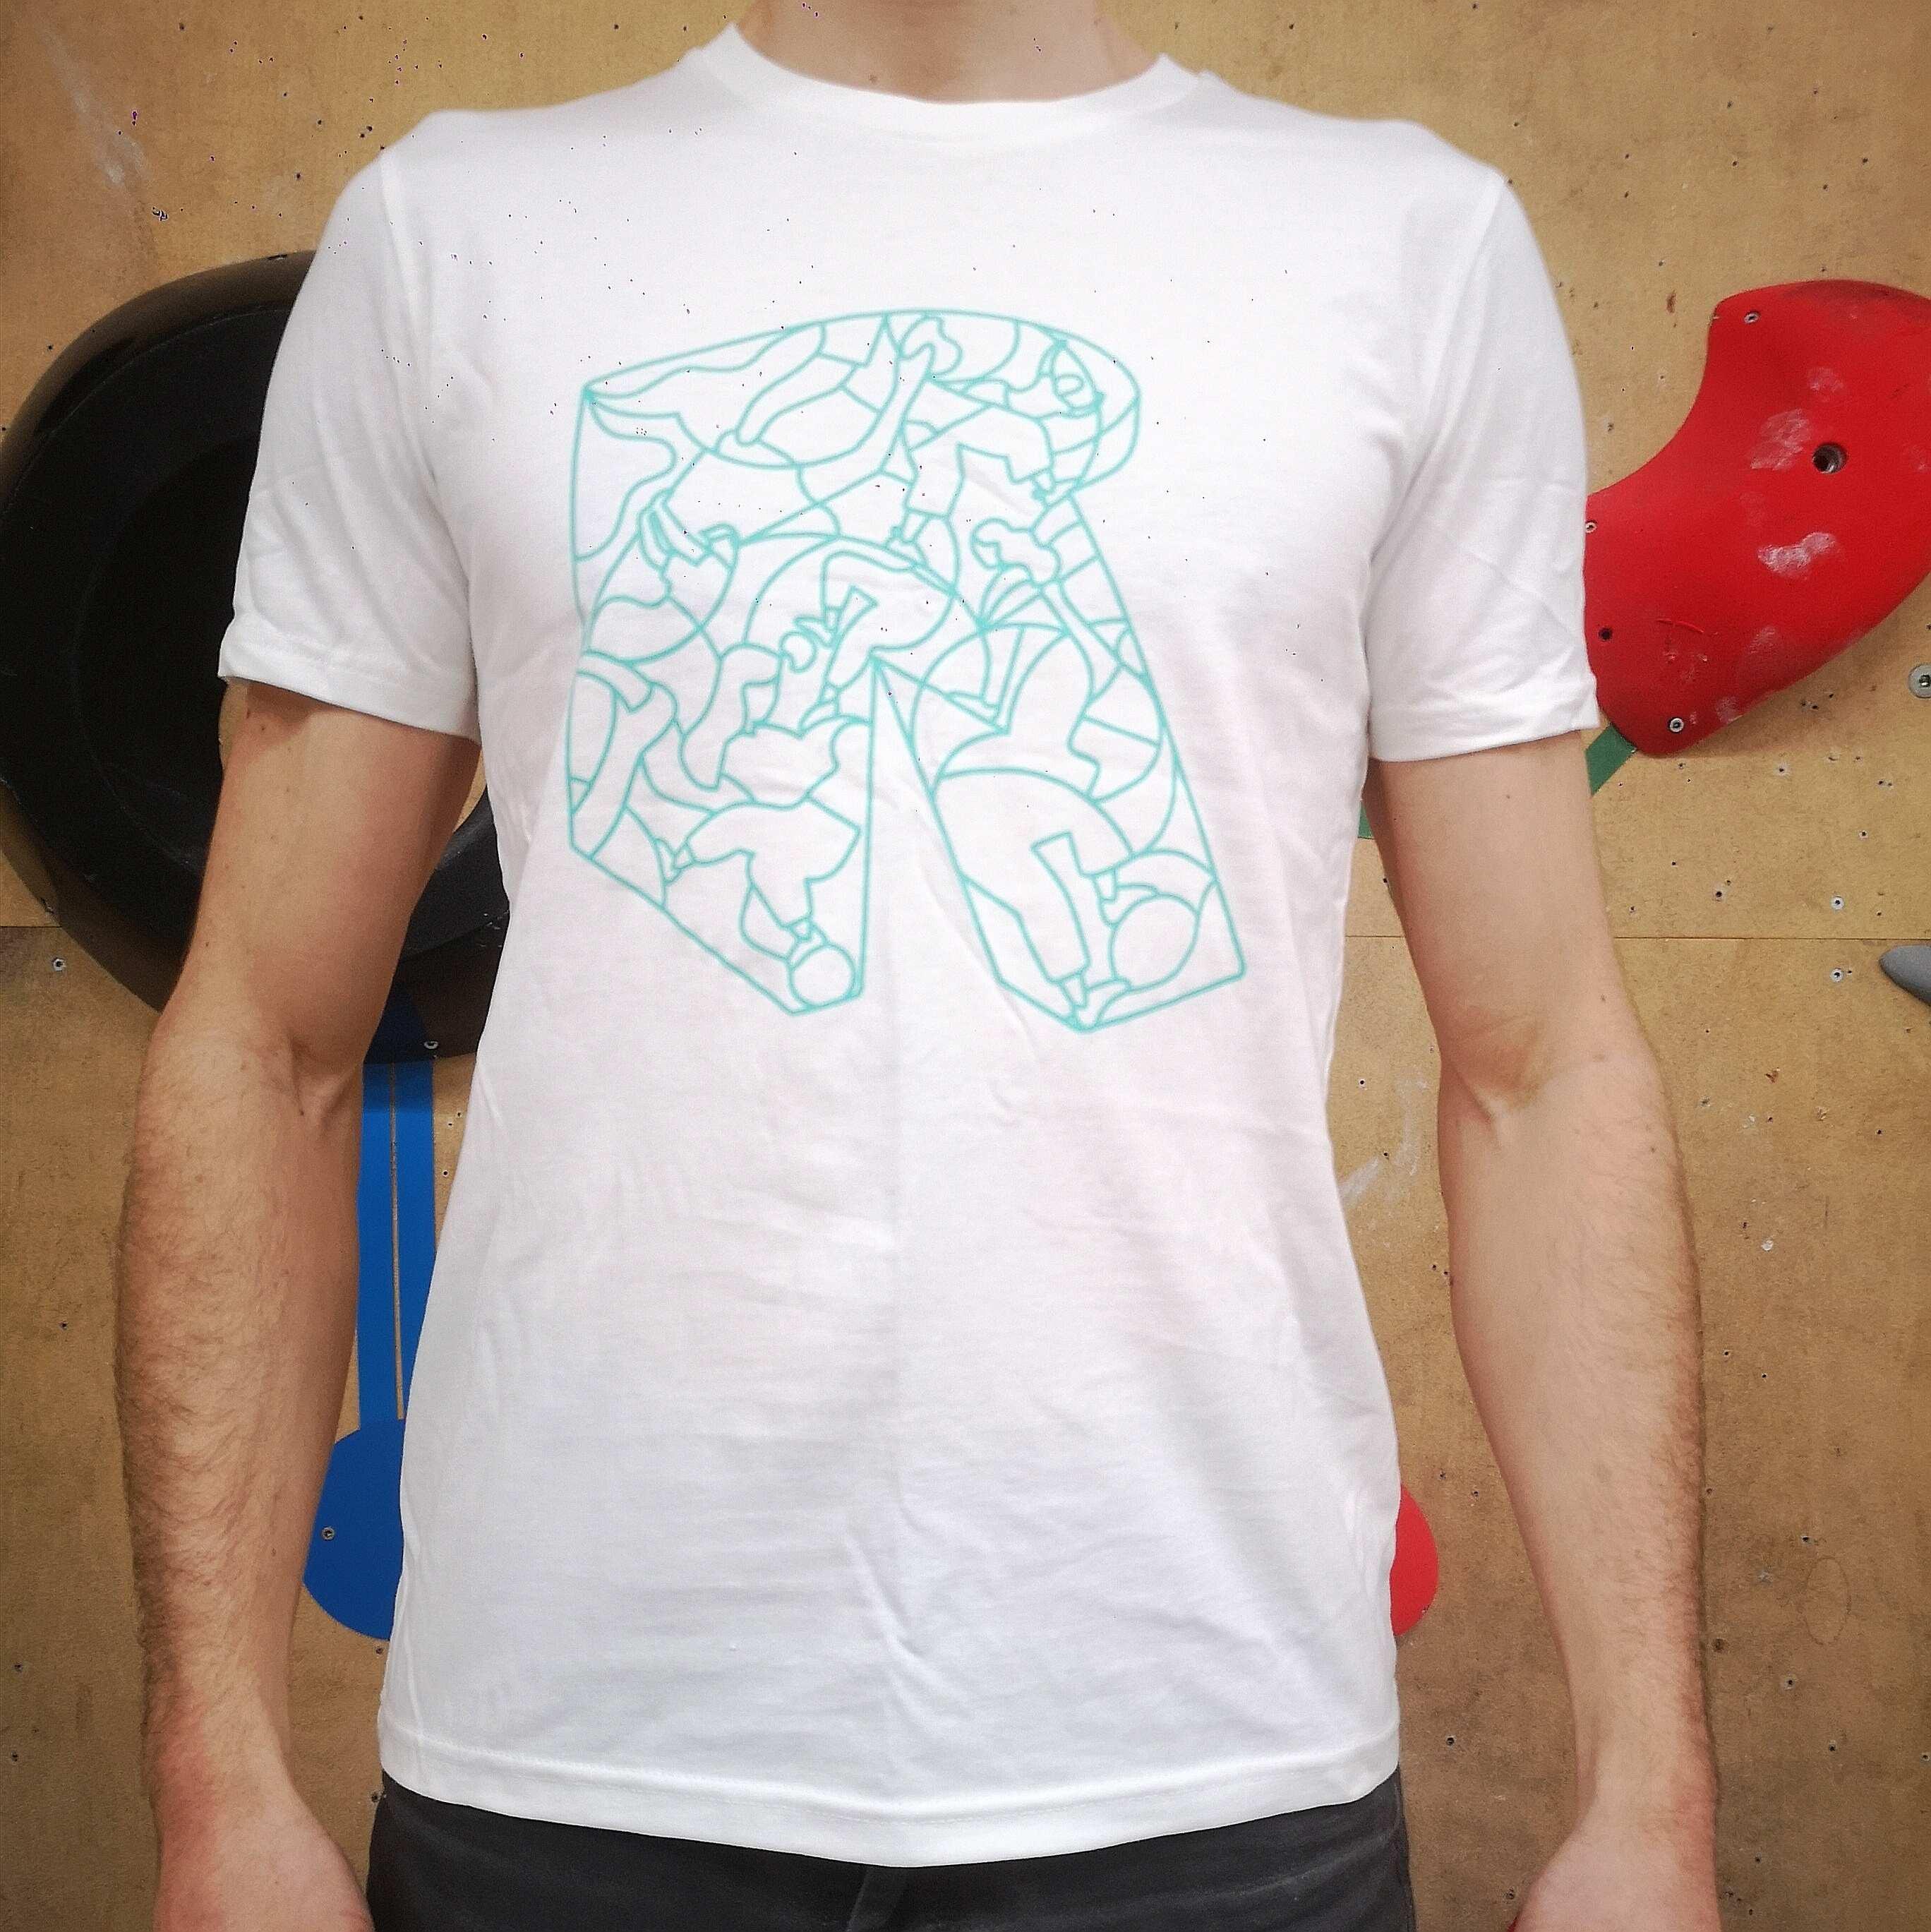 TS homme - Blanc R vert